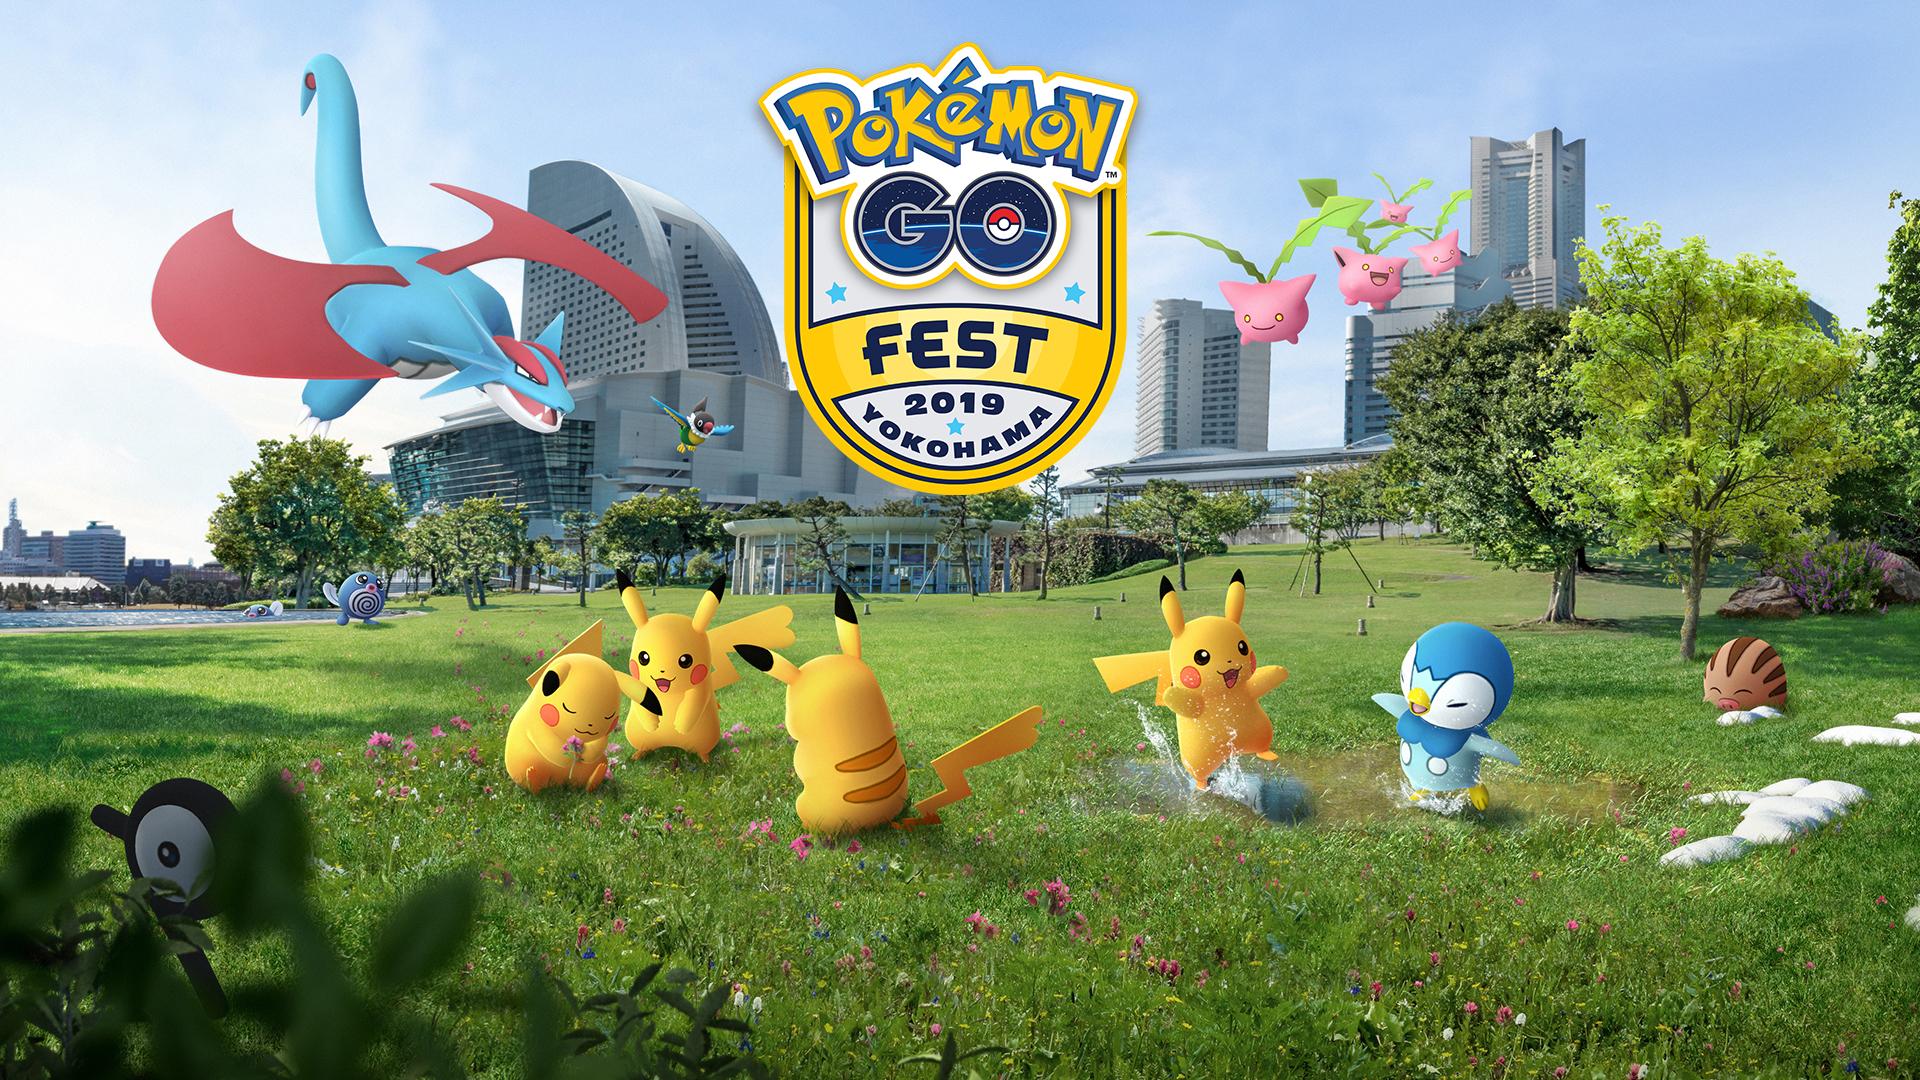 GO Fest Yokohama 2019